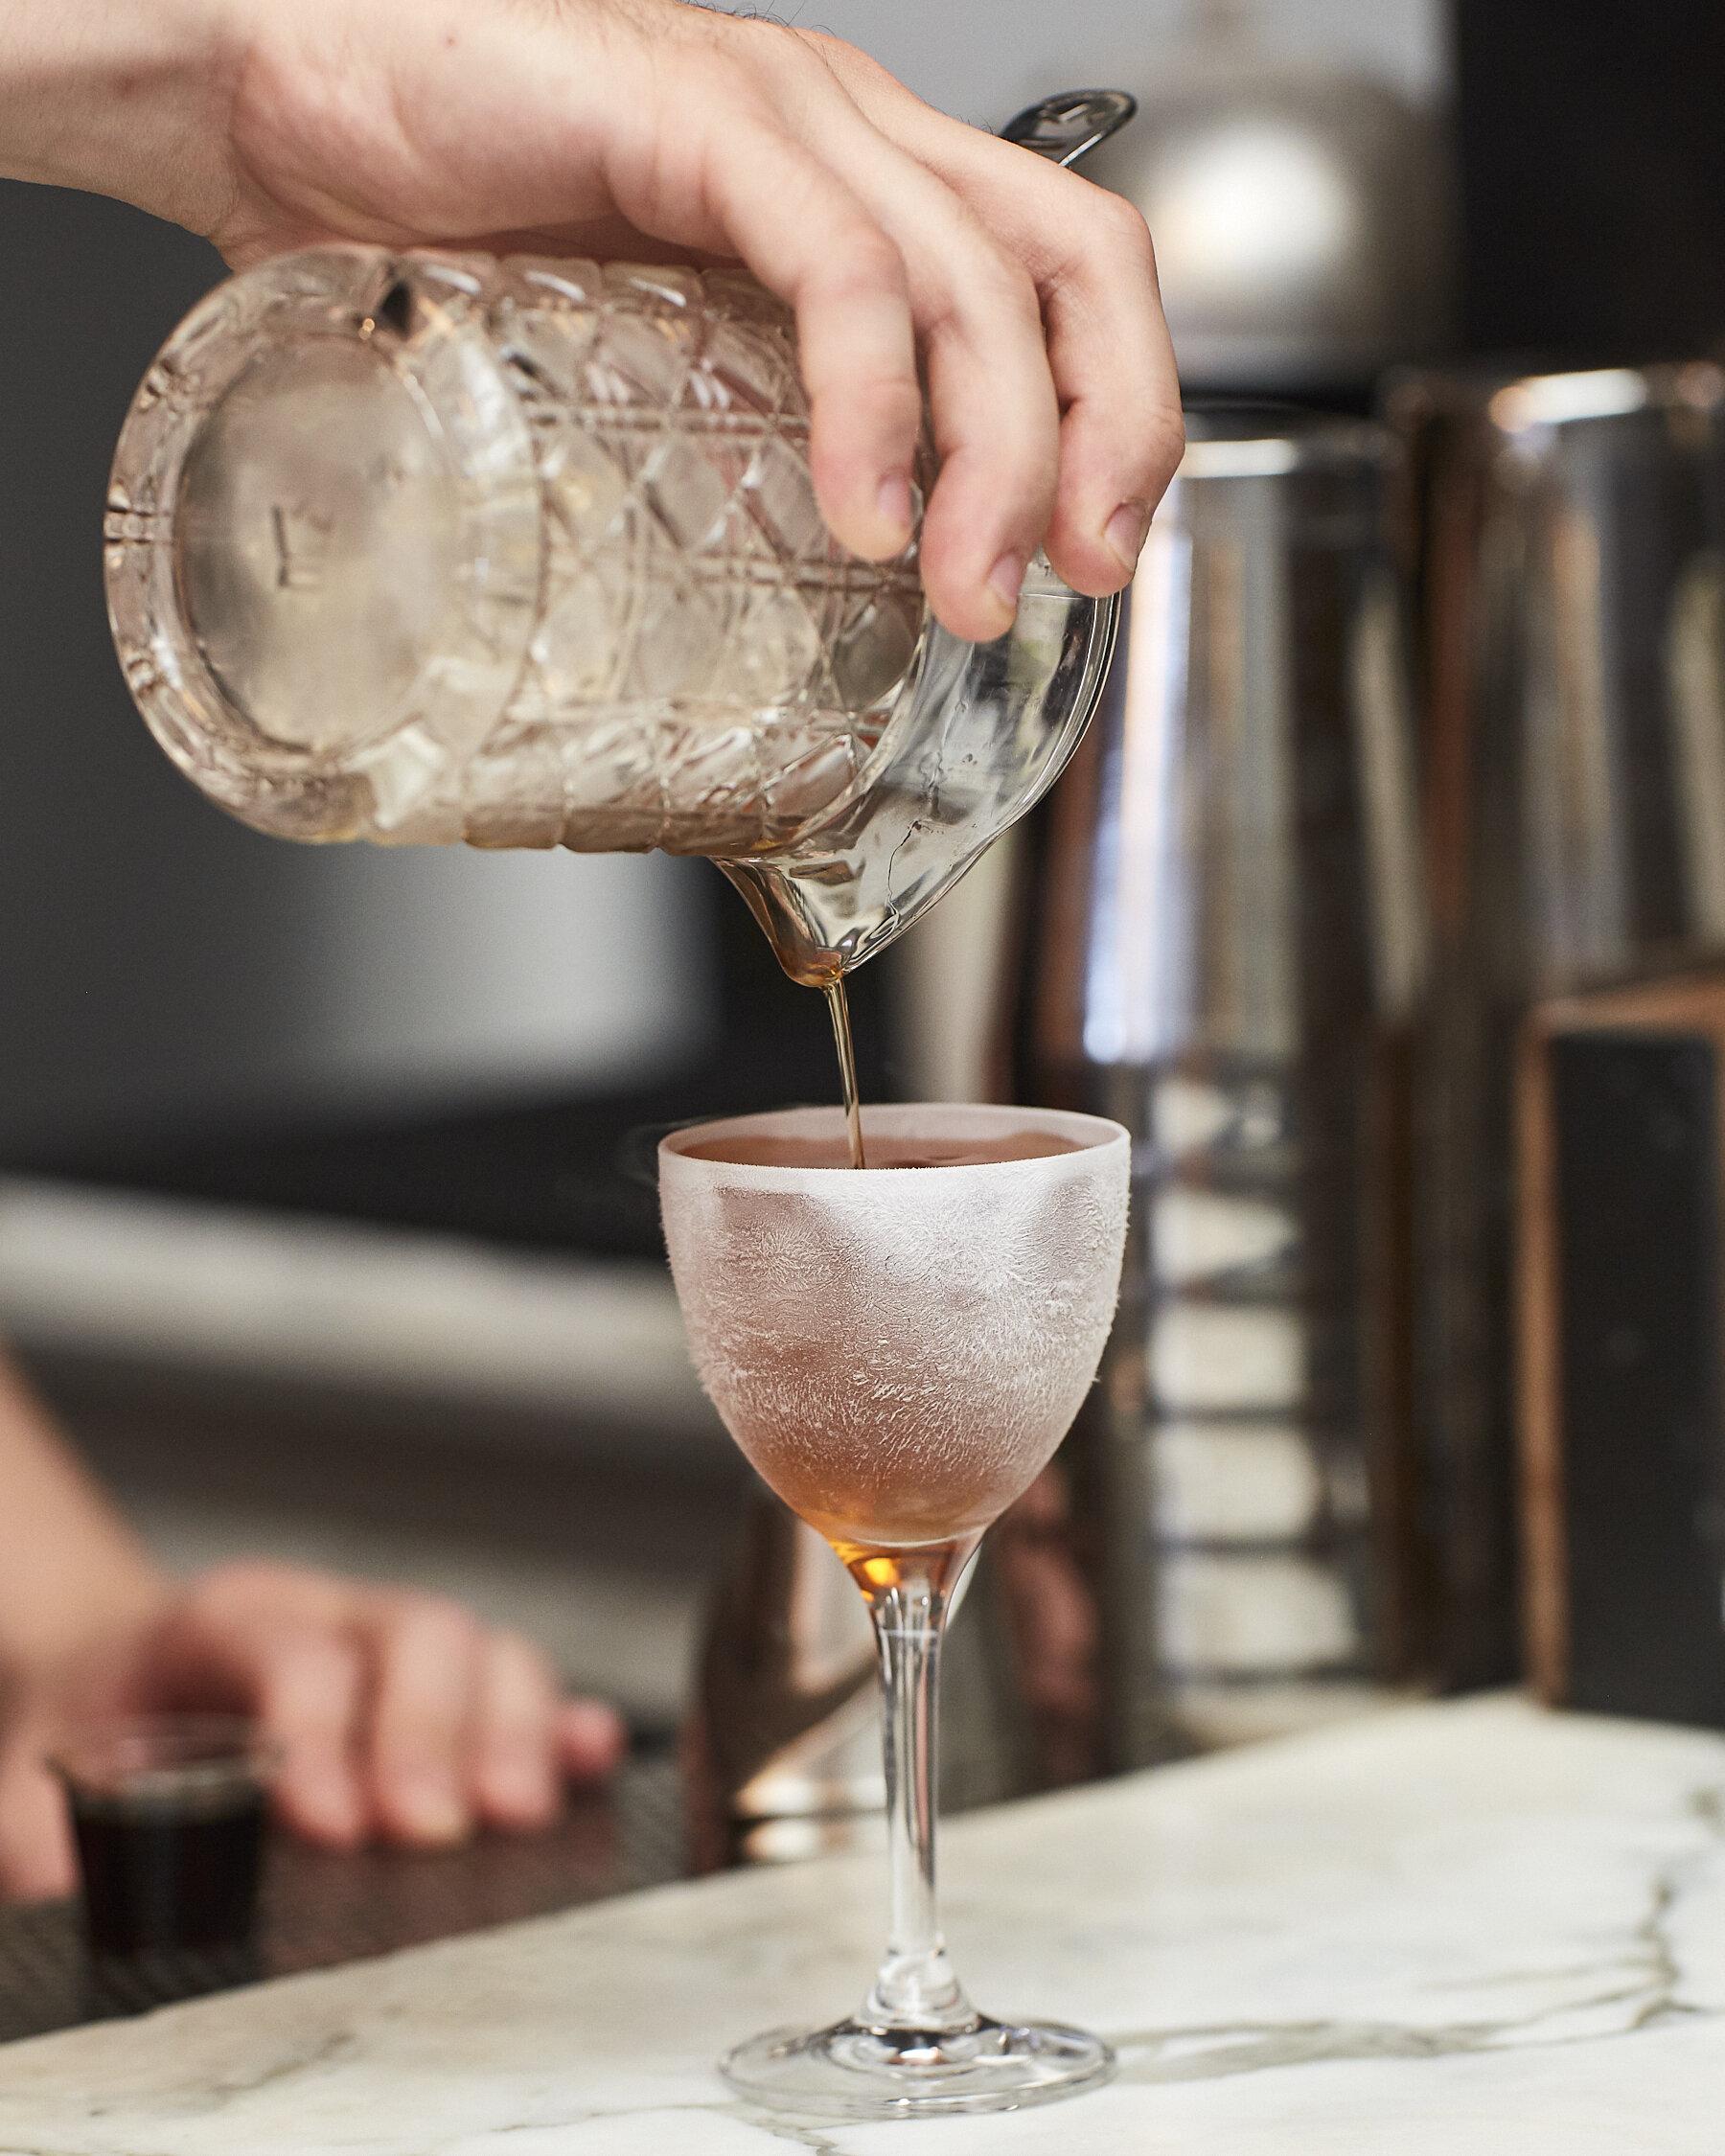 Cocktail at Service Bar.